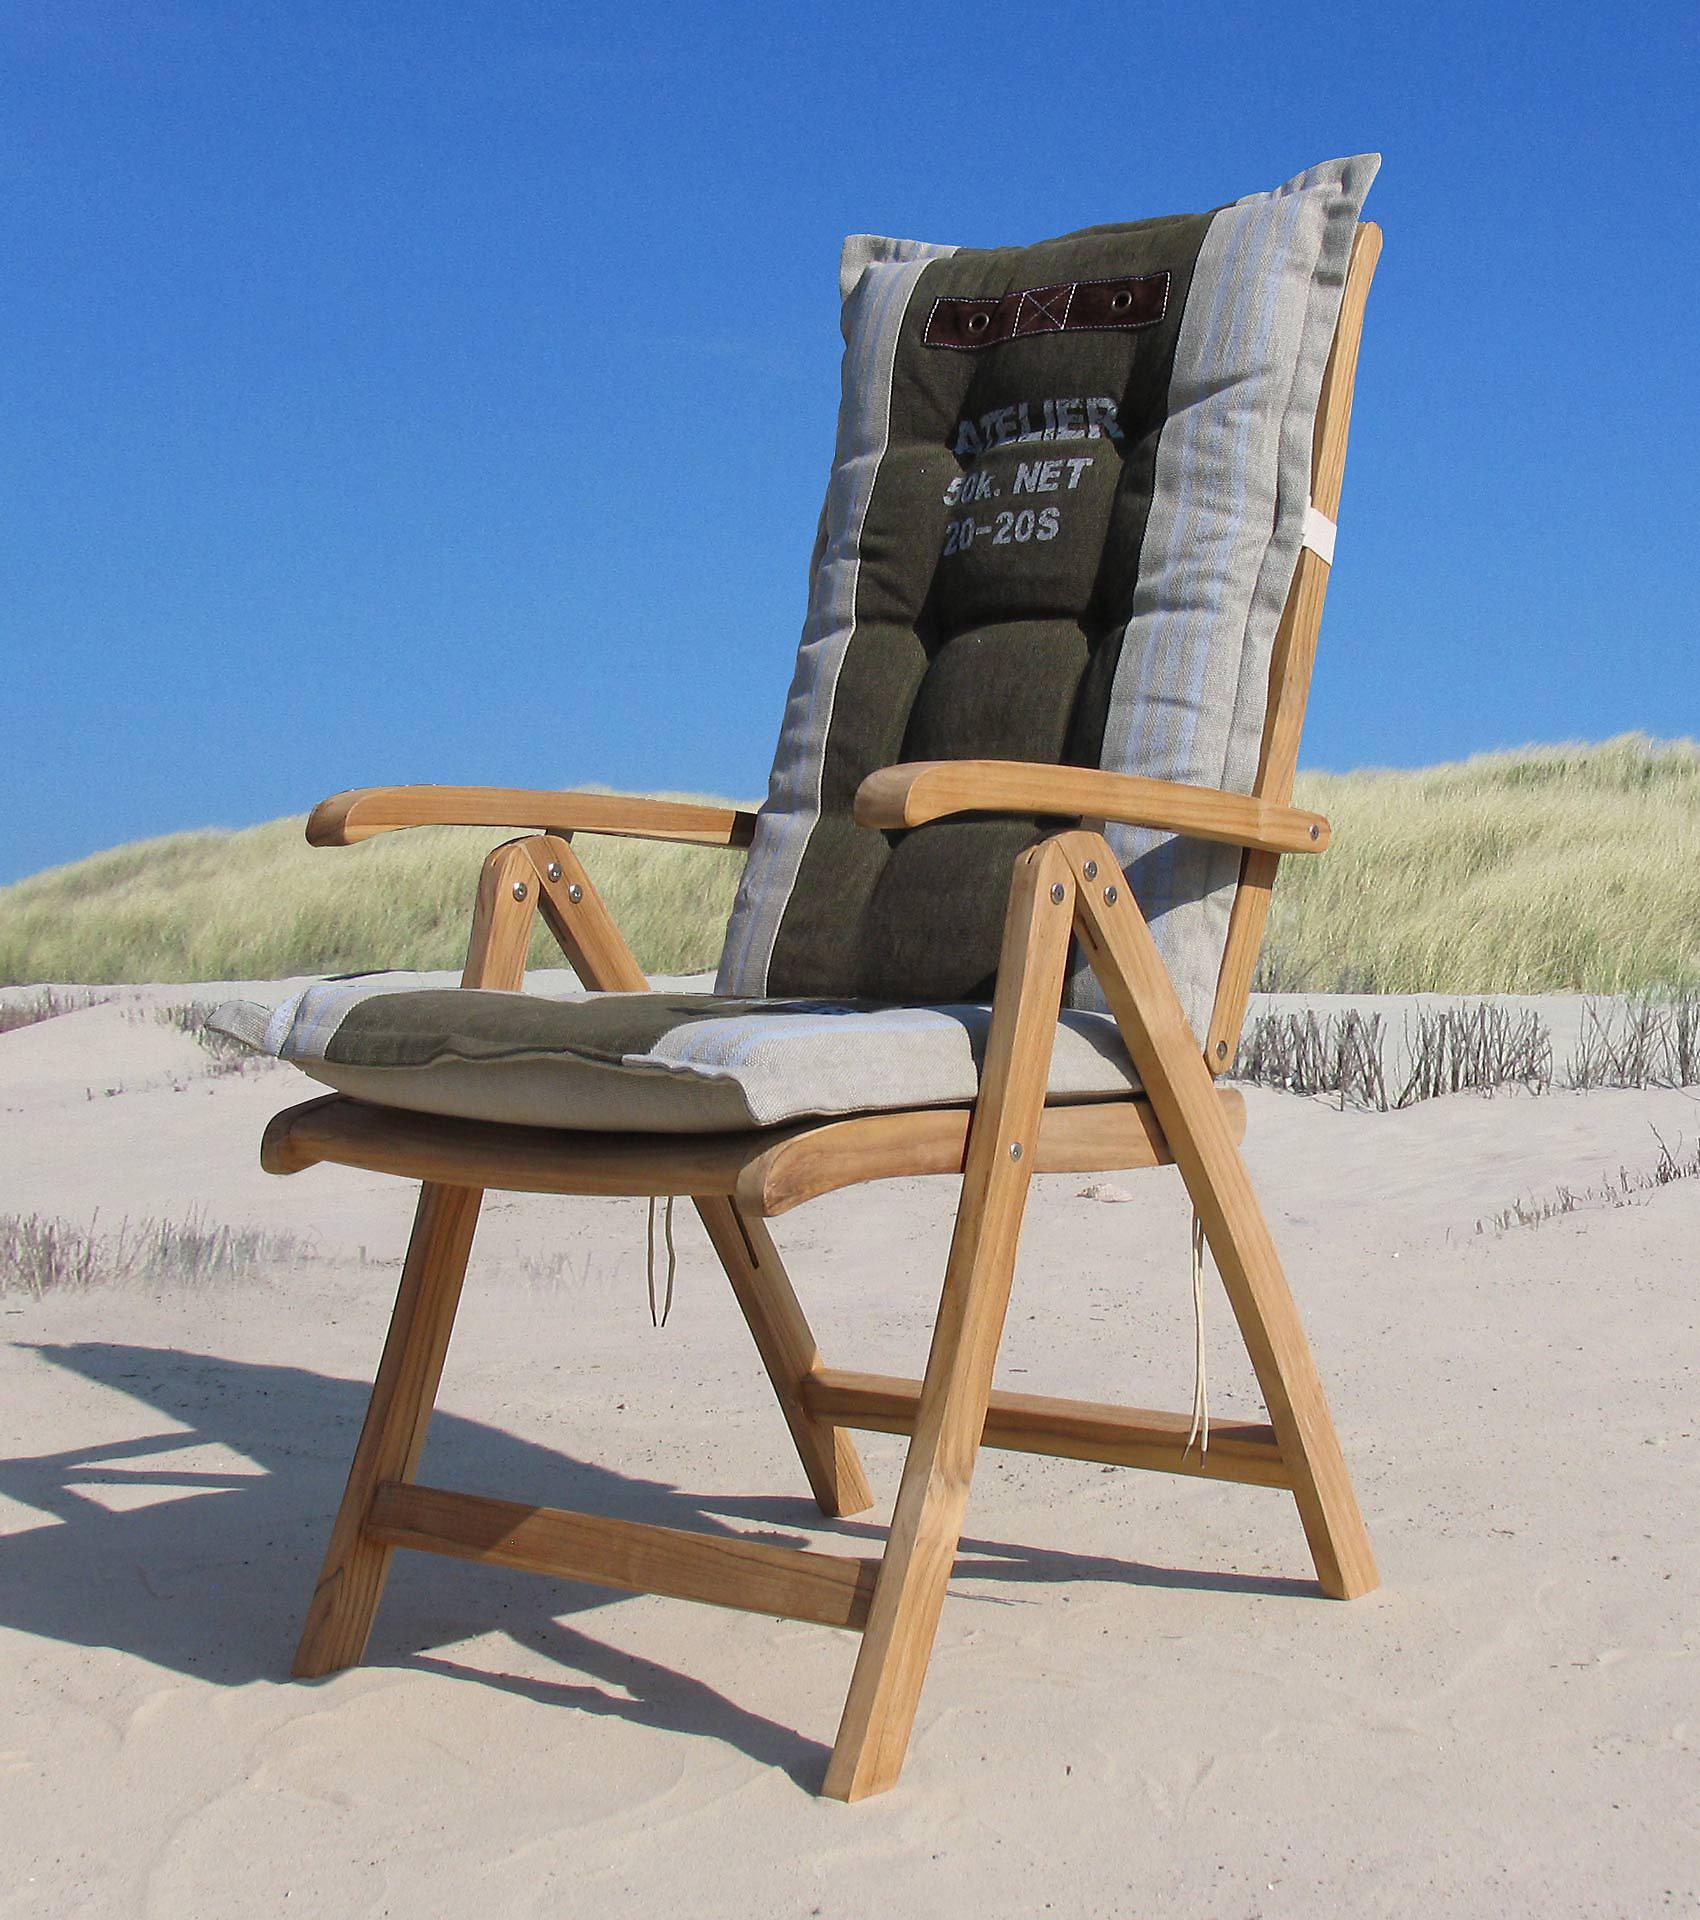 Grasekamp Teak Sessel Verstellbar Gartenstühle Klappstuhl Teak Holz